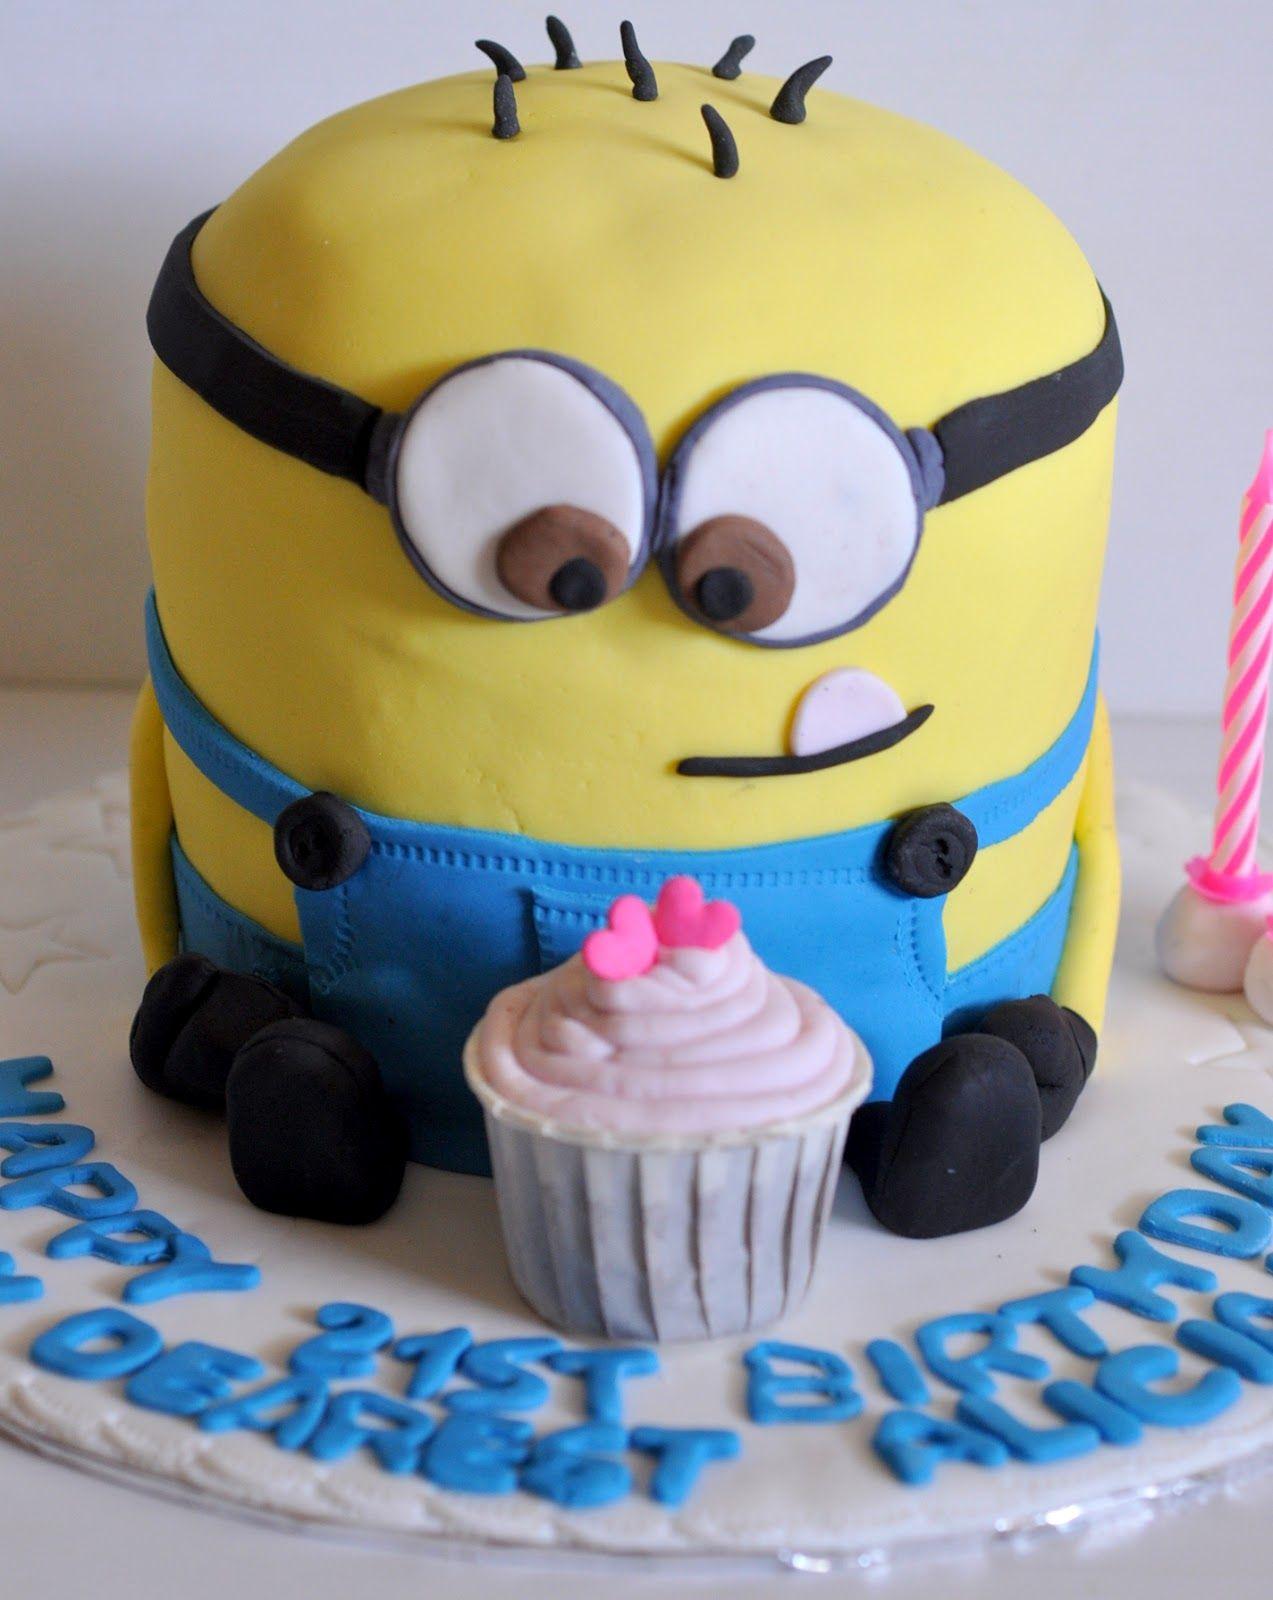 Izahs Kitchen Despicable Me Birthday Cake Cool Cakes Pinterest